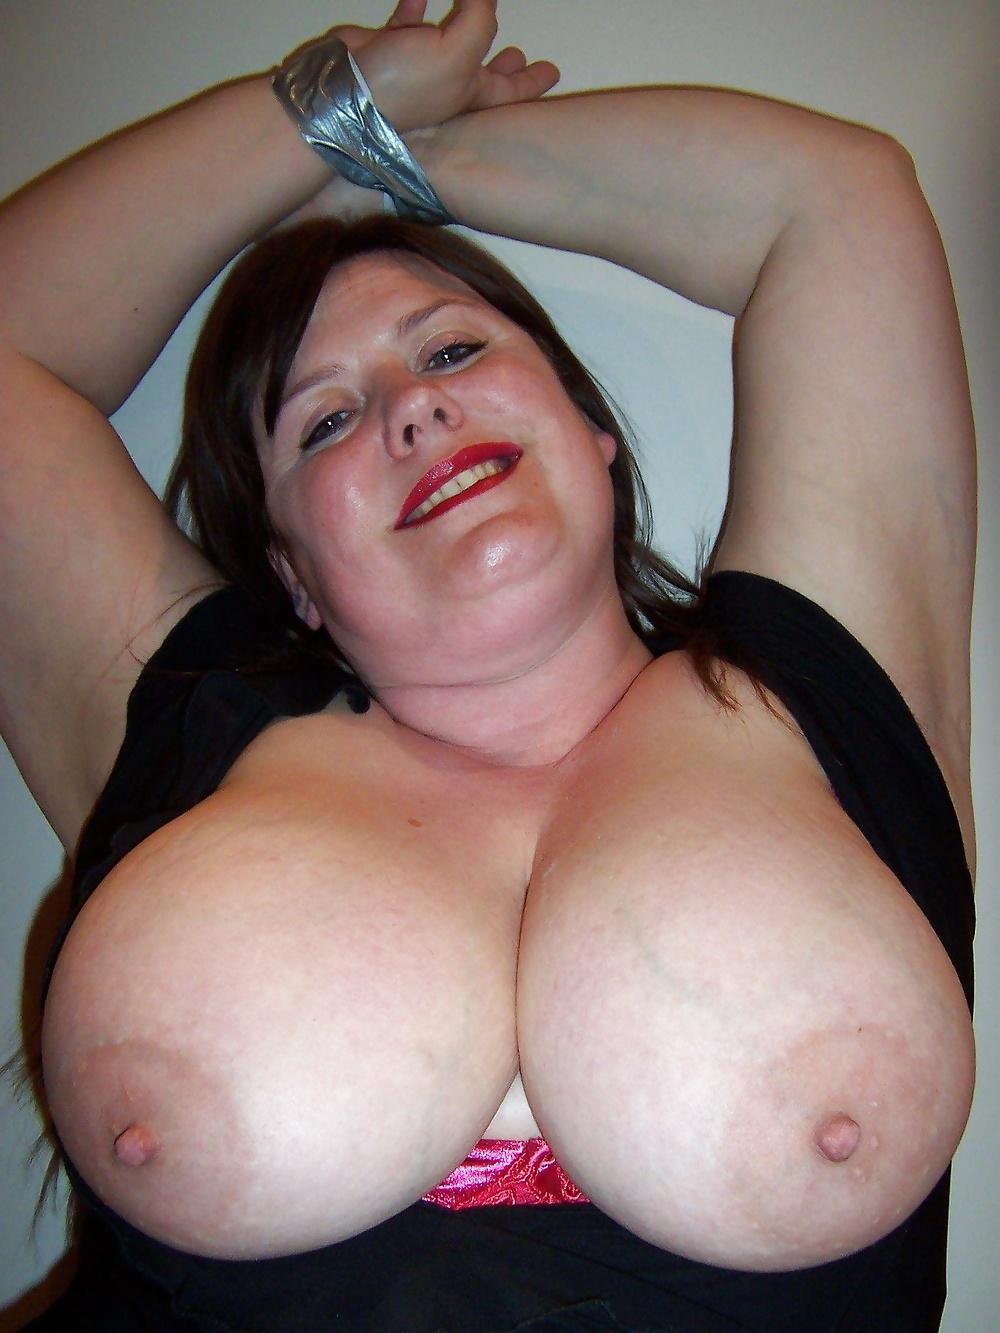 Massive Tits Fat Pussy Vs Big Cock Let Them Fight